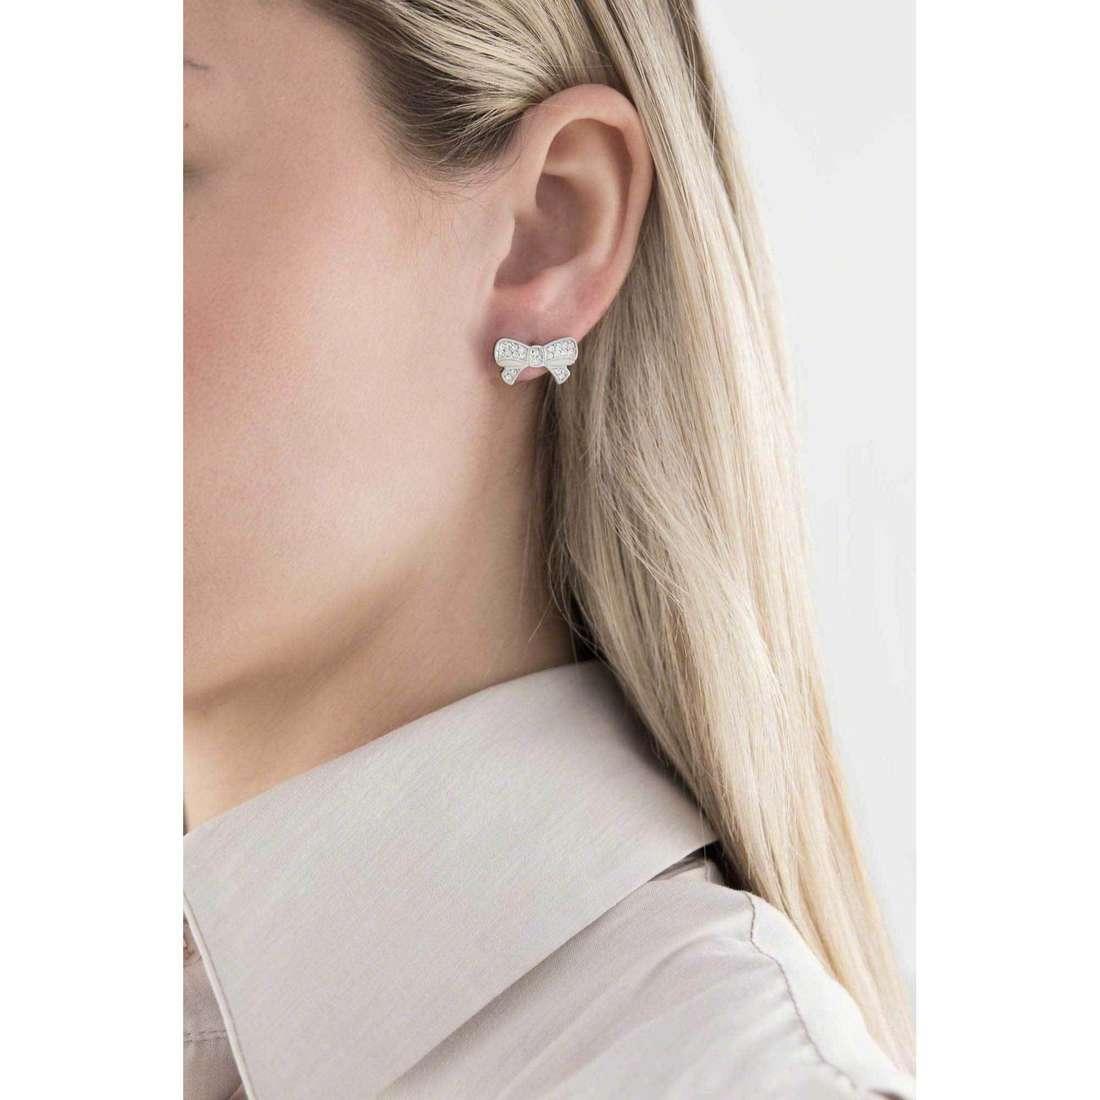 Sagapò boucles d'oreille Fantasia femme SFS22 indosso